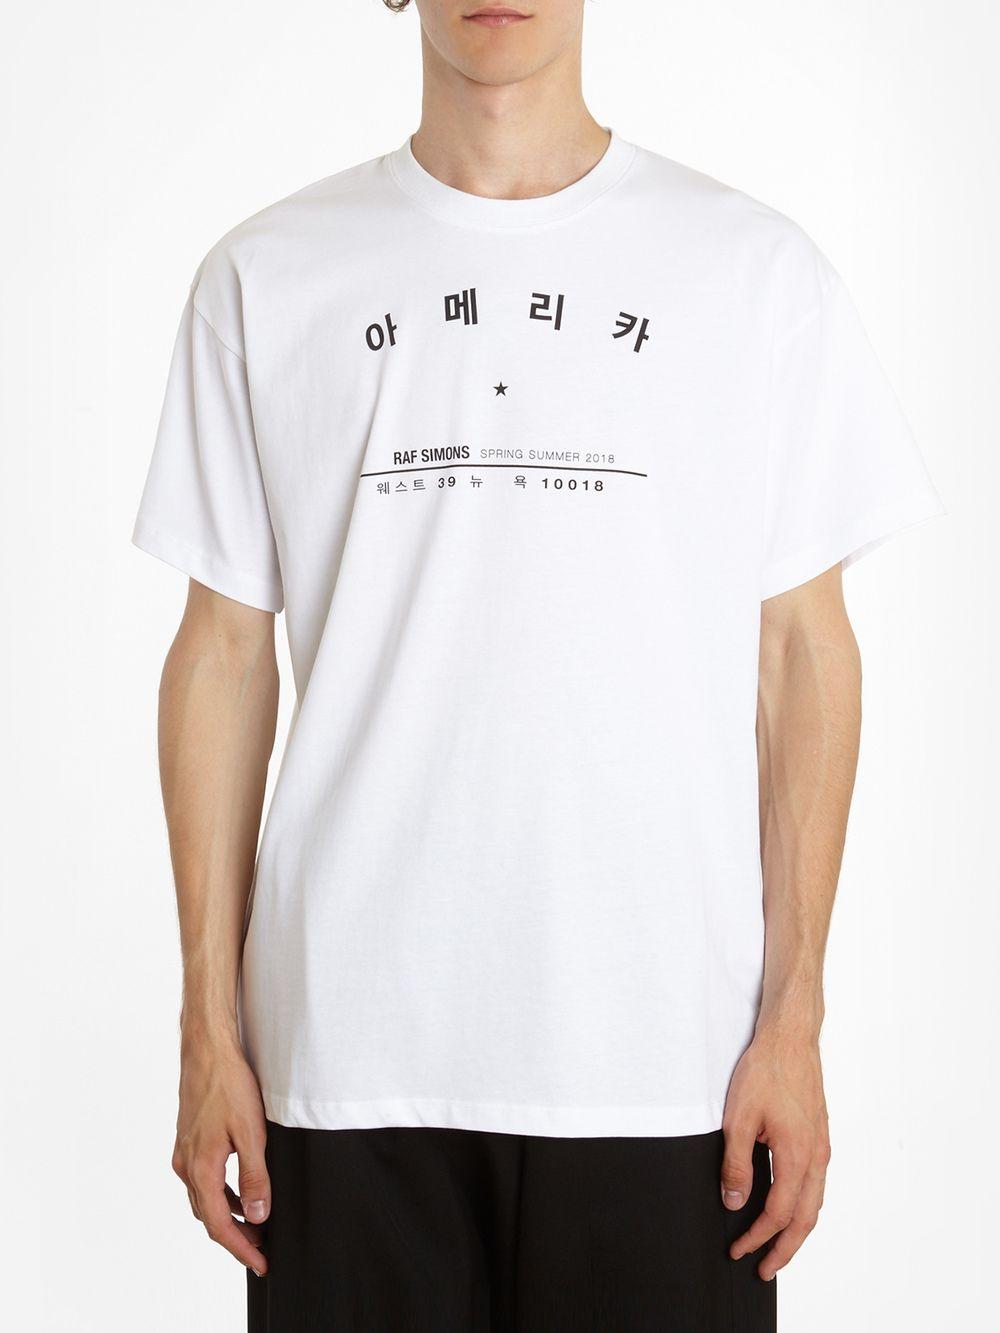 5ffd3aa8 Raf Simons T-shirts 18112019000 00010 | Raf Simons | Shirts, Raf ...